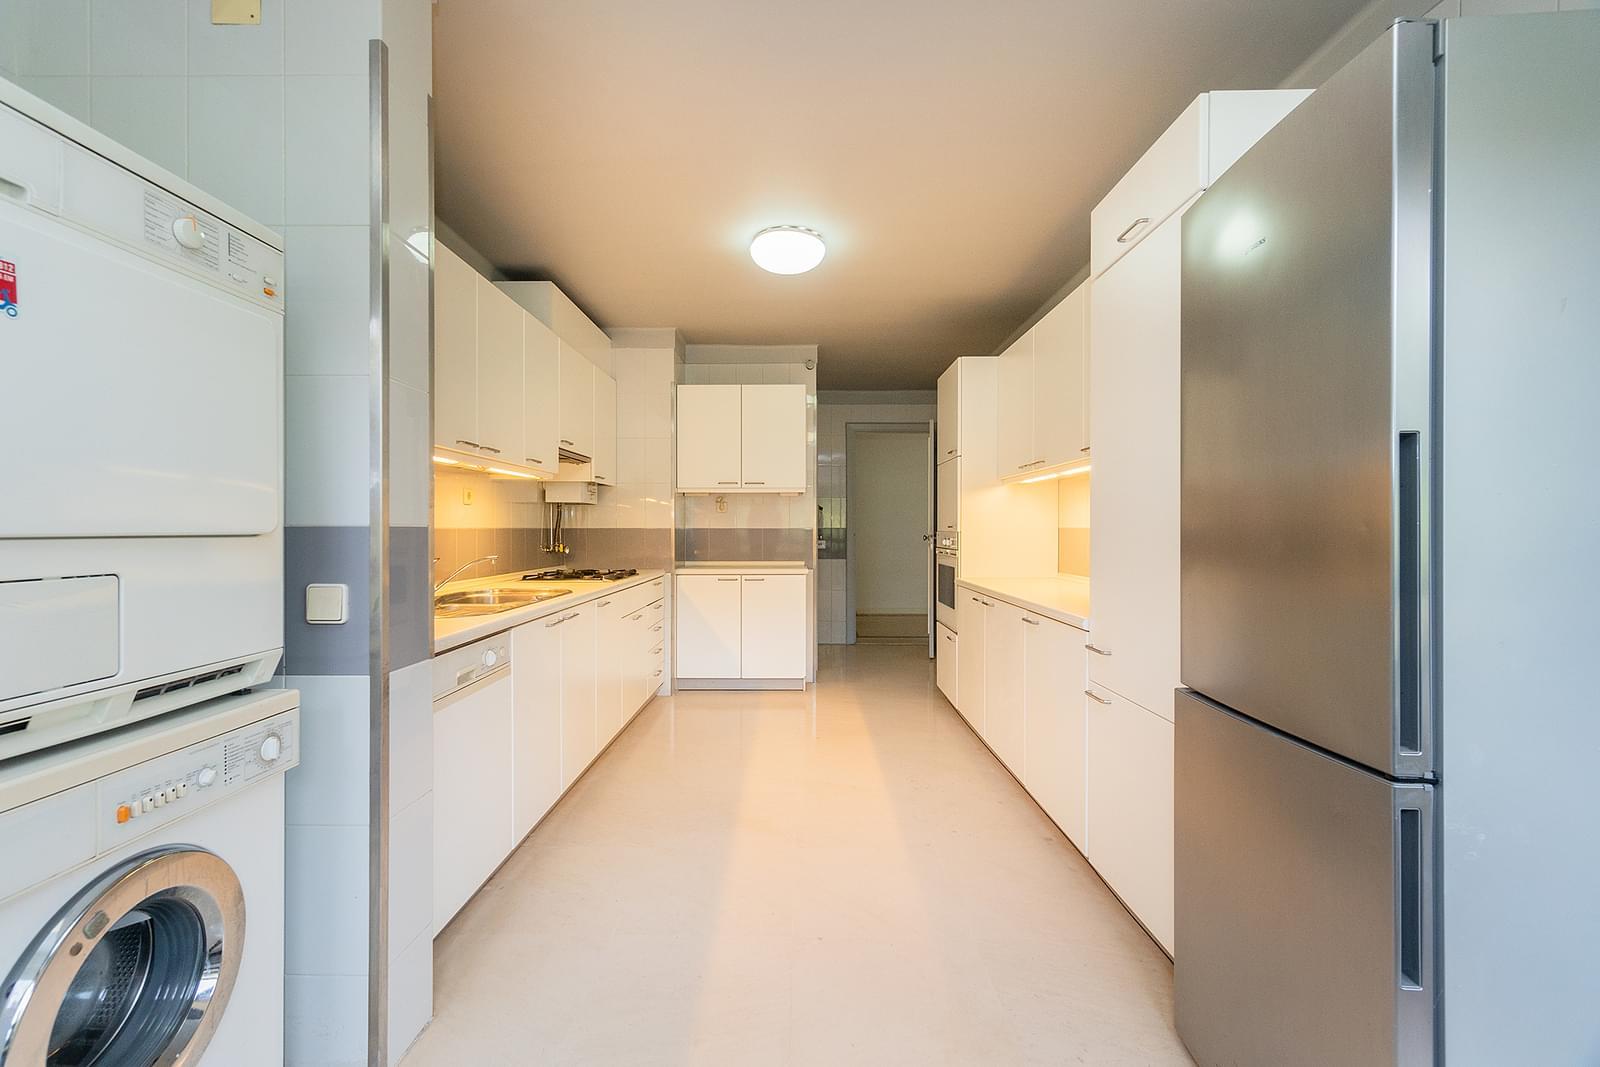 pf18551-apartamento-t3-1-lisboa-88c9080f-7126-437e-b0b7-3e9525166425